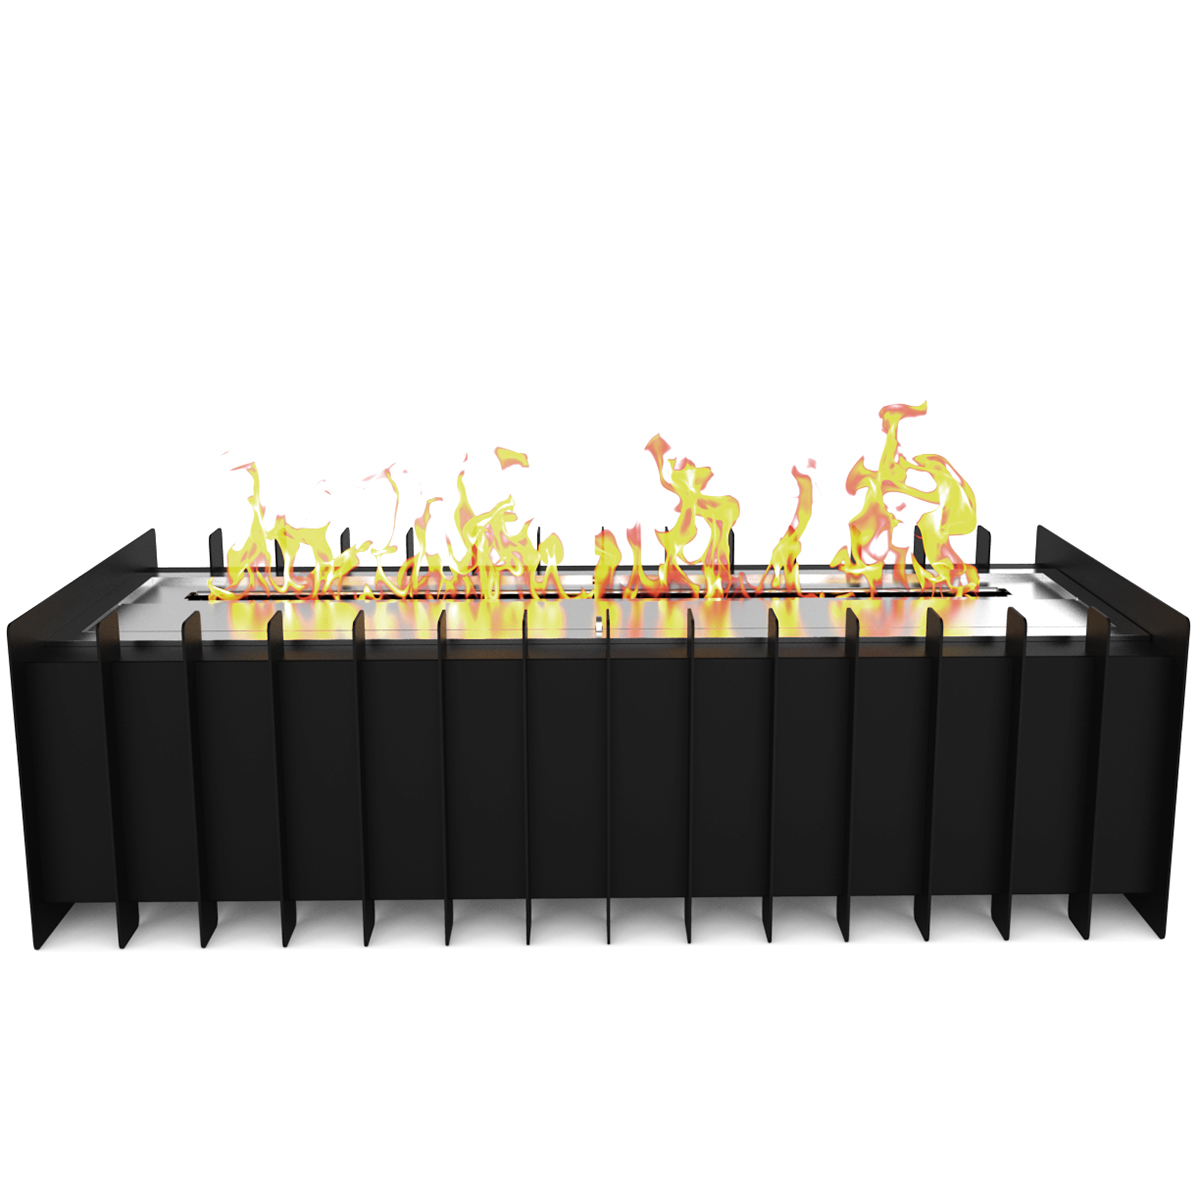 pro 18 in ventless bio ethanol fireplace grate burner insert 2 6 liter